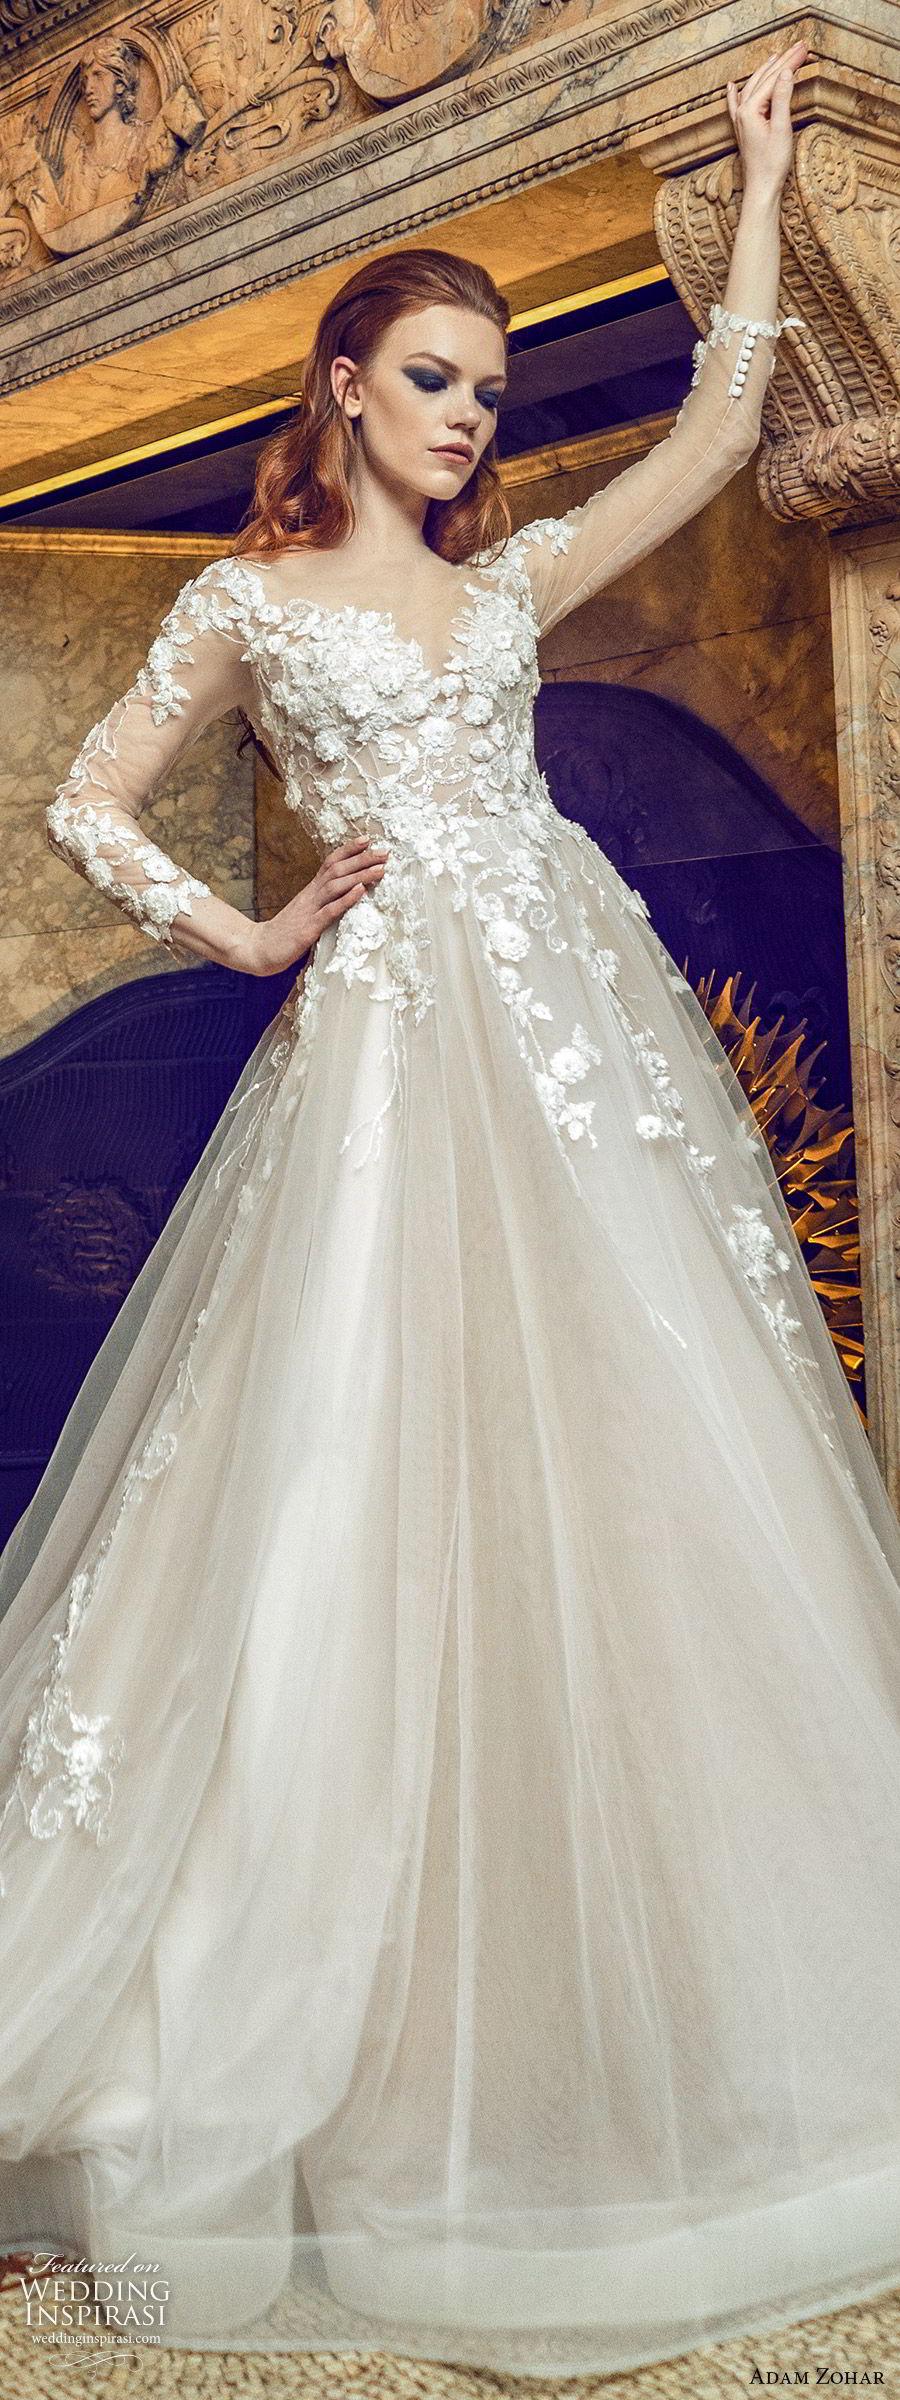 adam zohar 2020 bridal illusion long slseeves sweetheart neckline embellished bodice a line ball gown wedding dress (1) blush romantic elegant chapel train lv